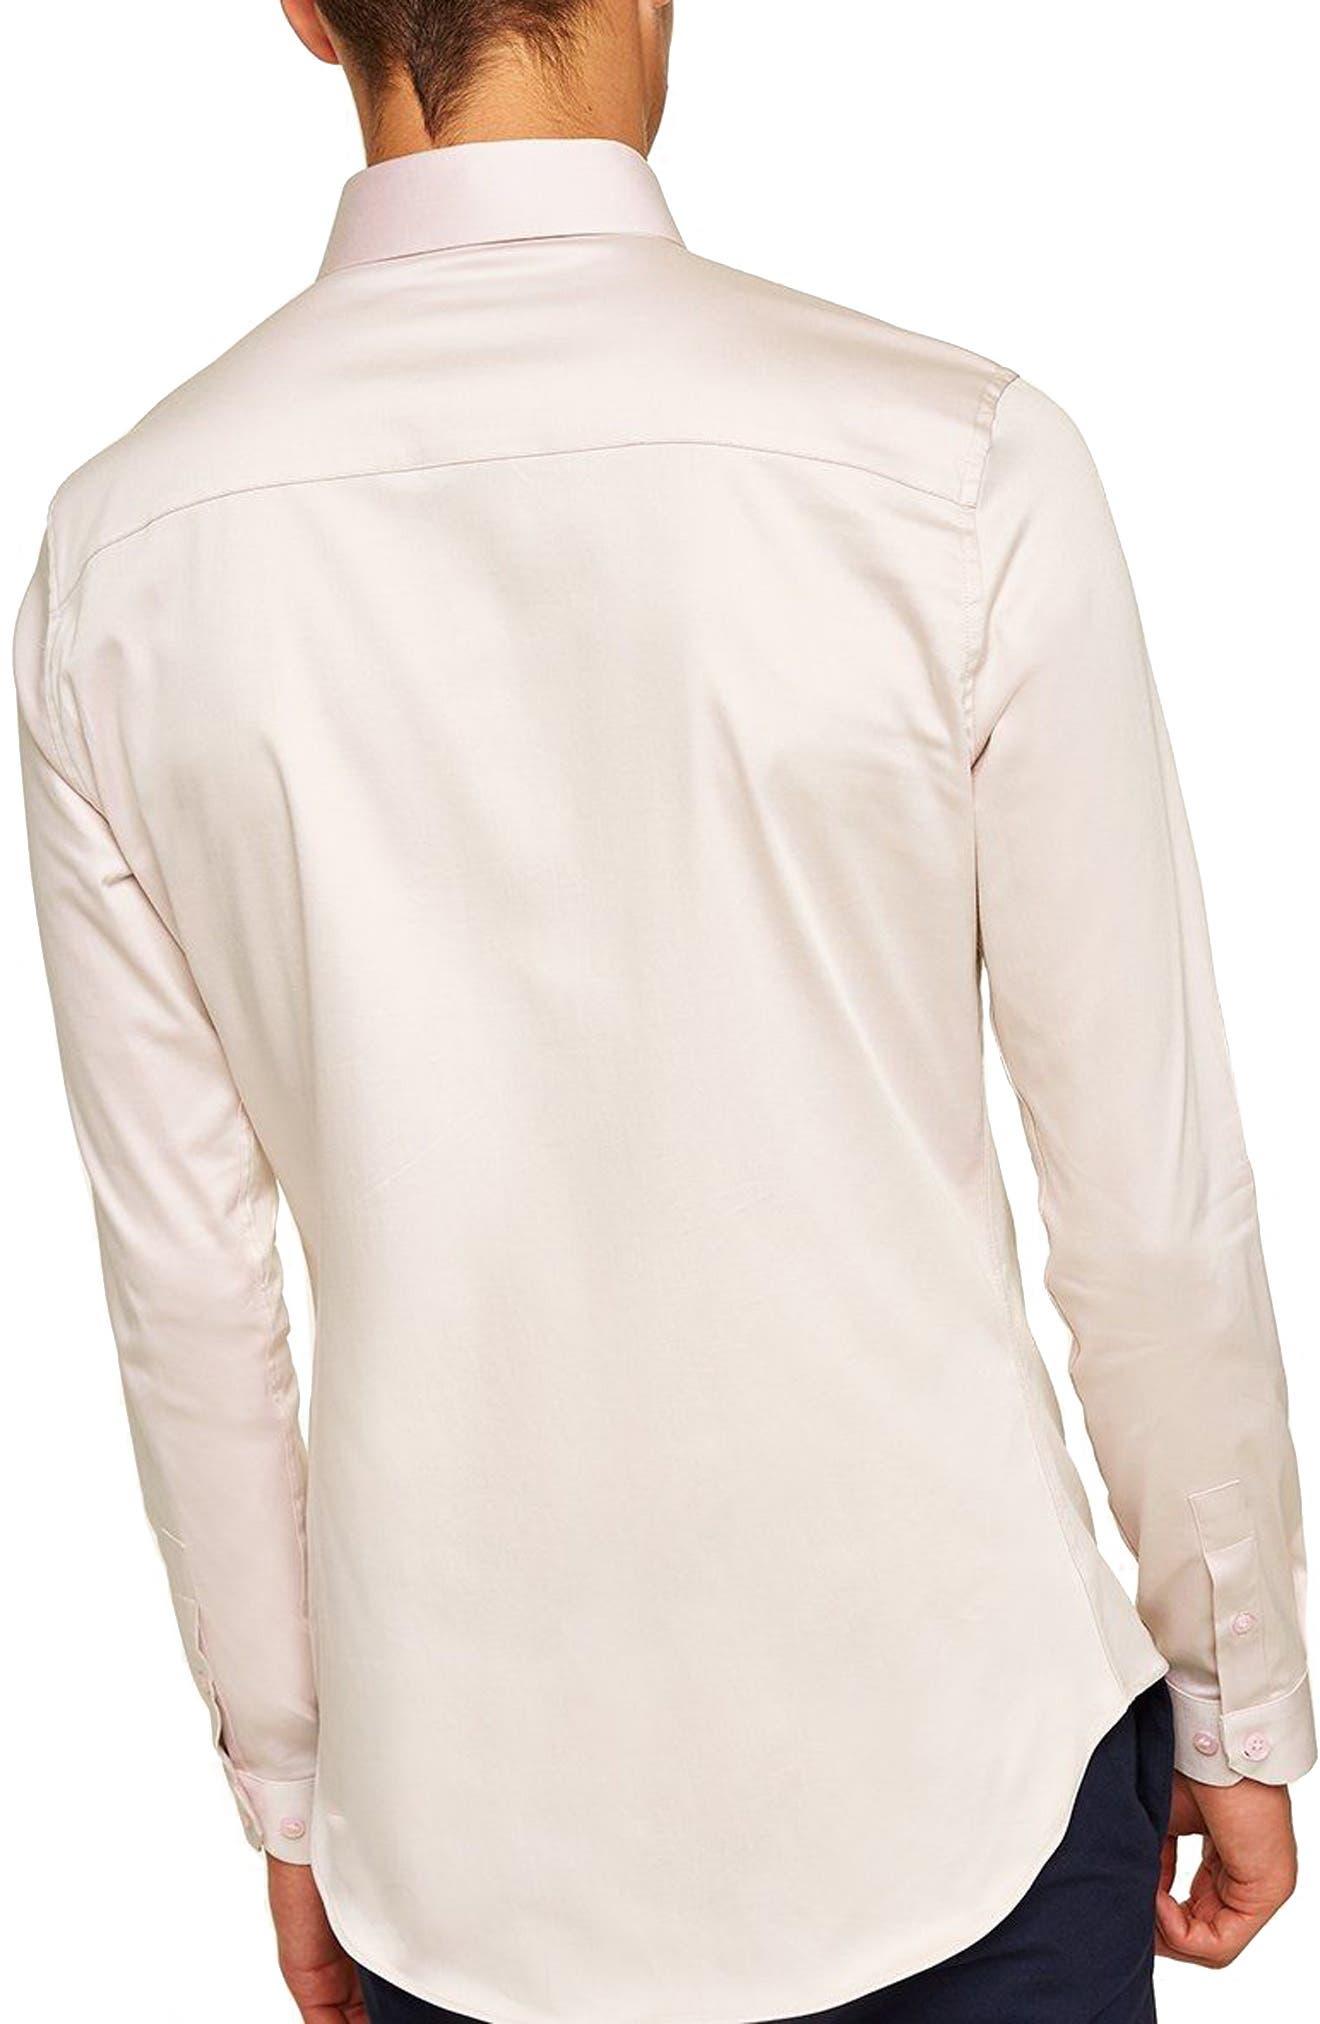 Stretch Smart Shirt,                             Alternate thumbnail 3, color,                             PURPLE